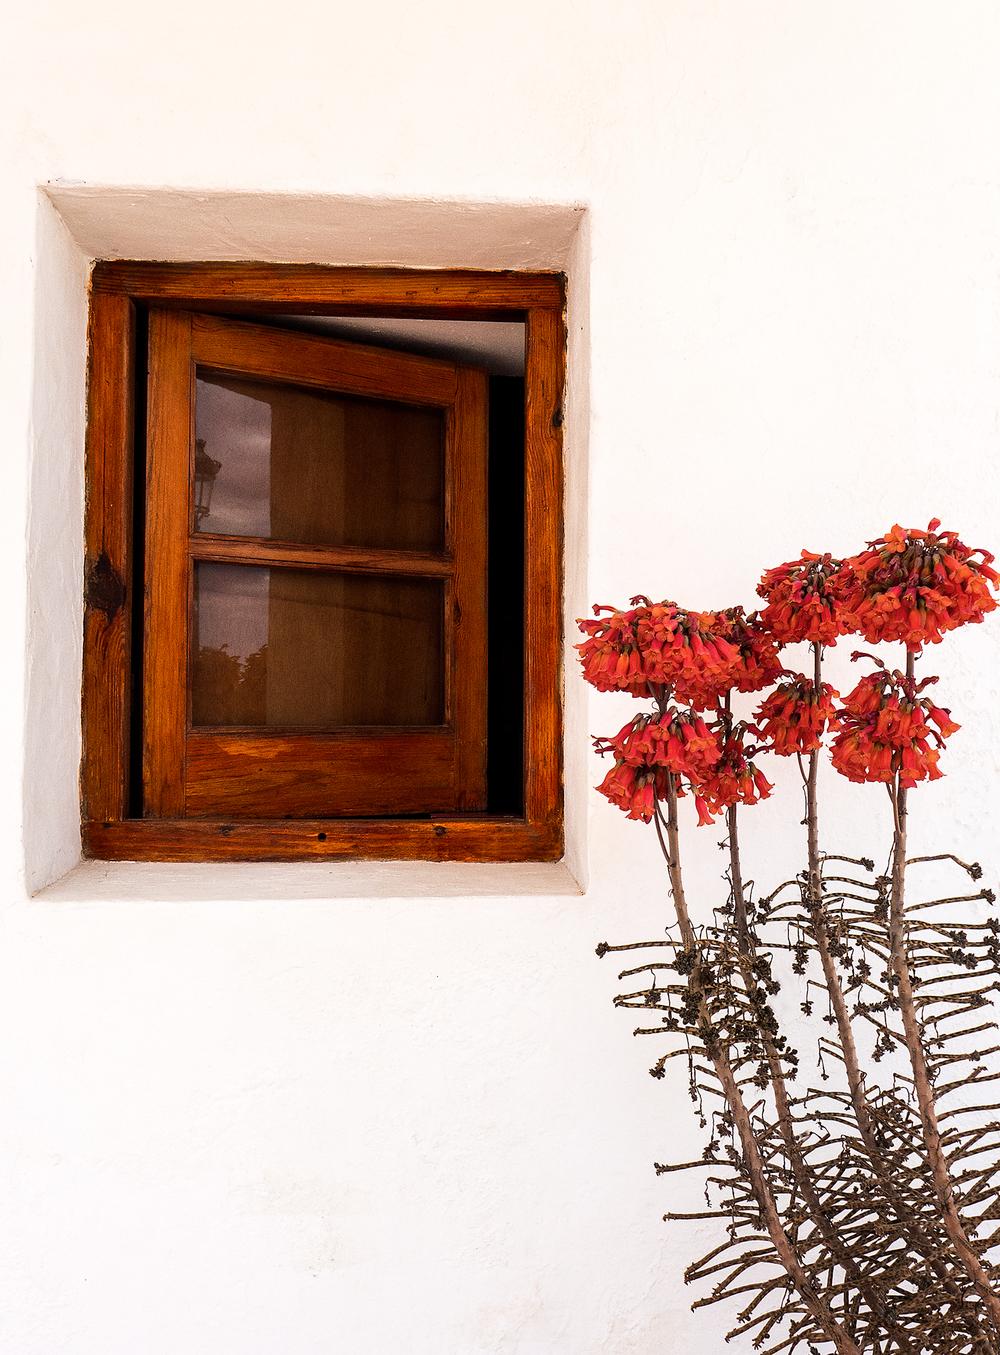 window_11x15 panel box.jpg